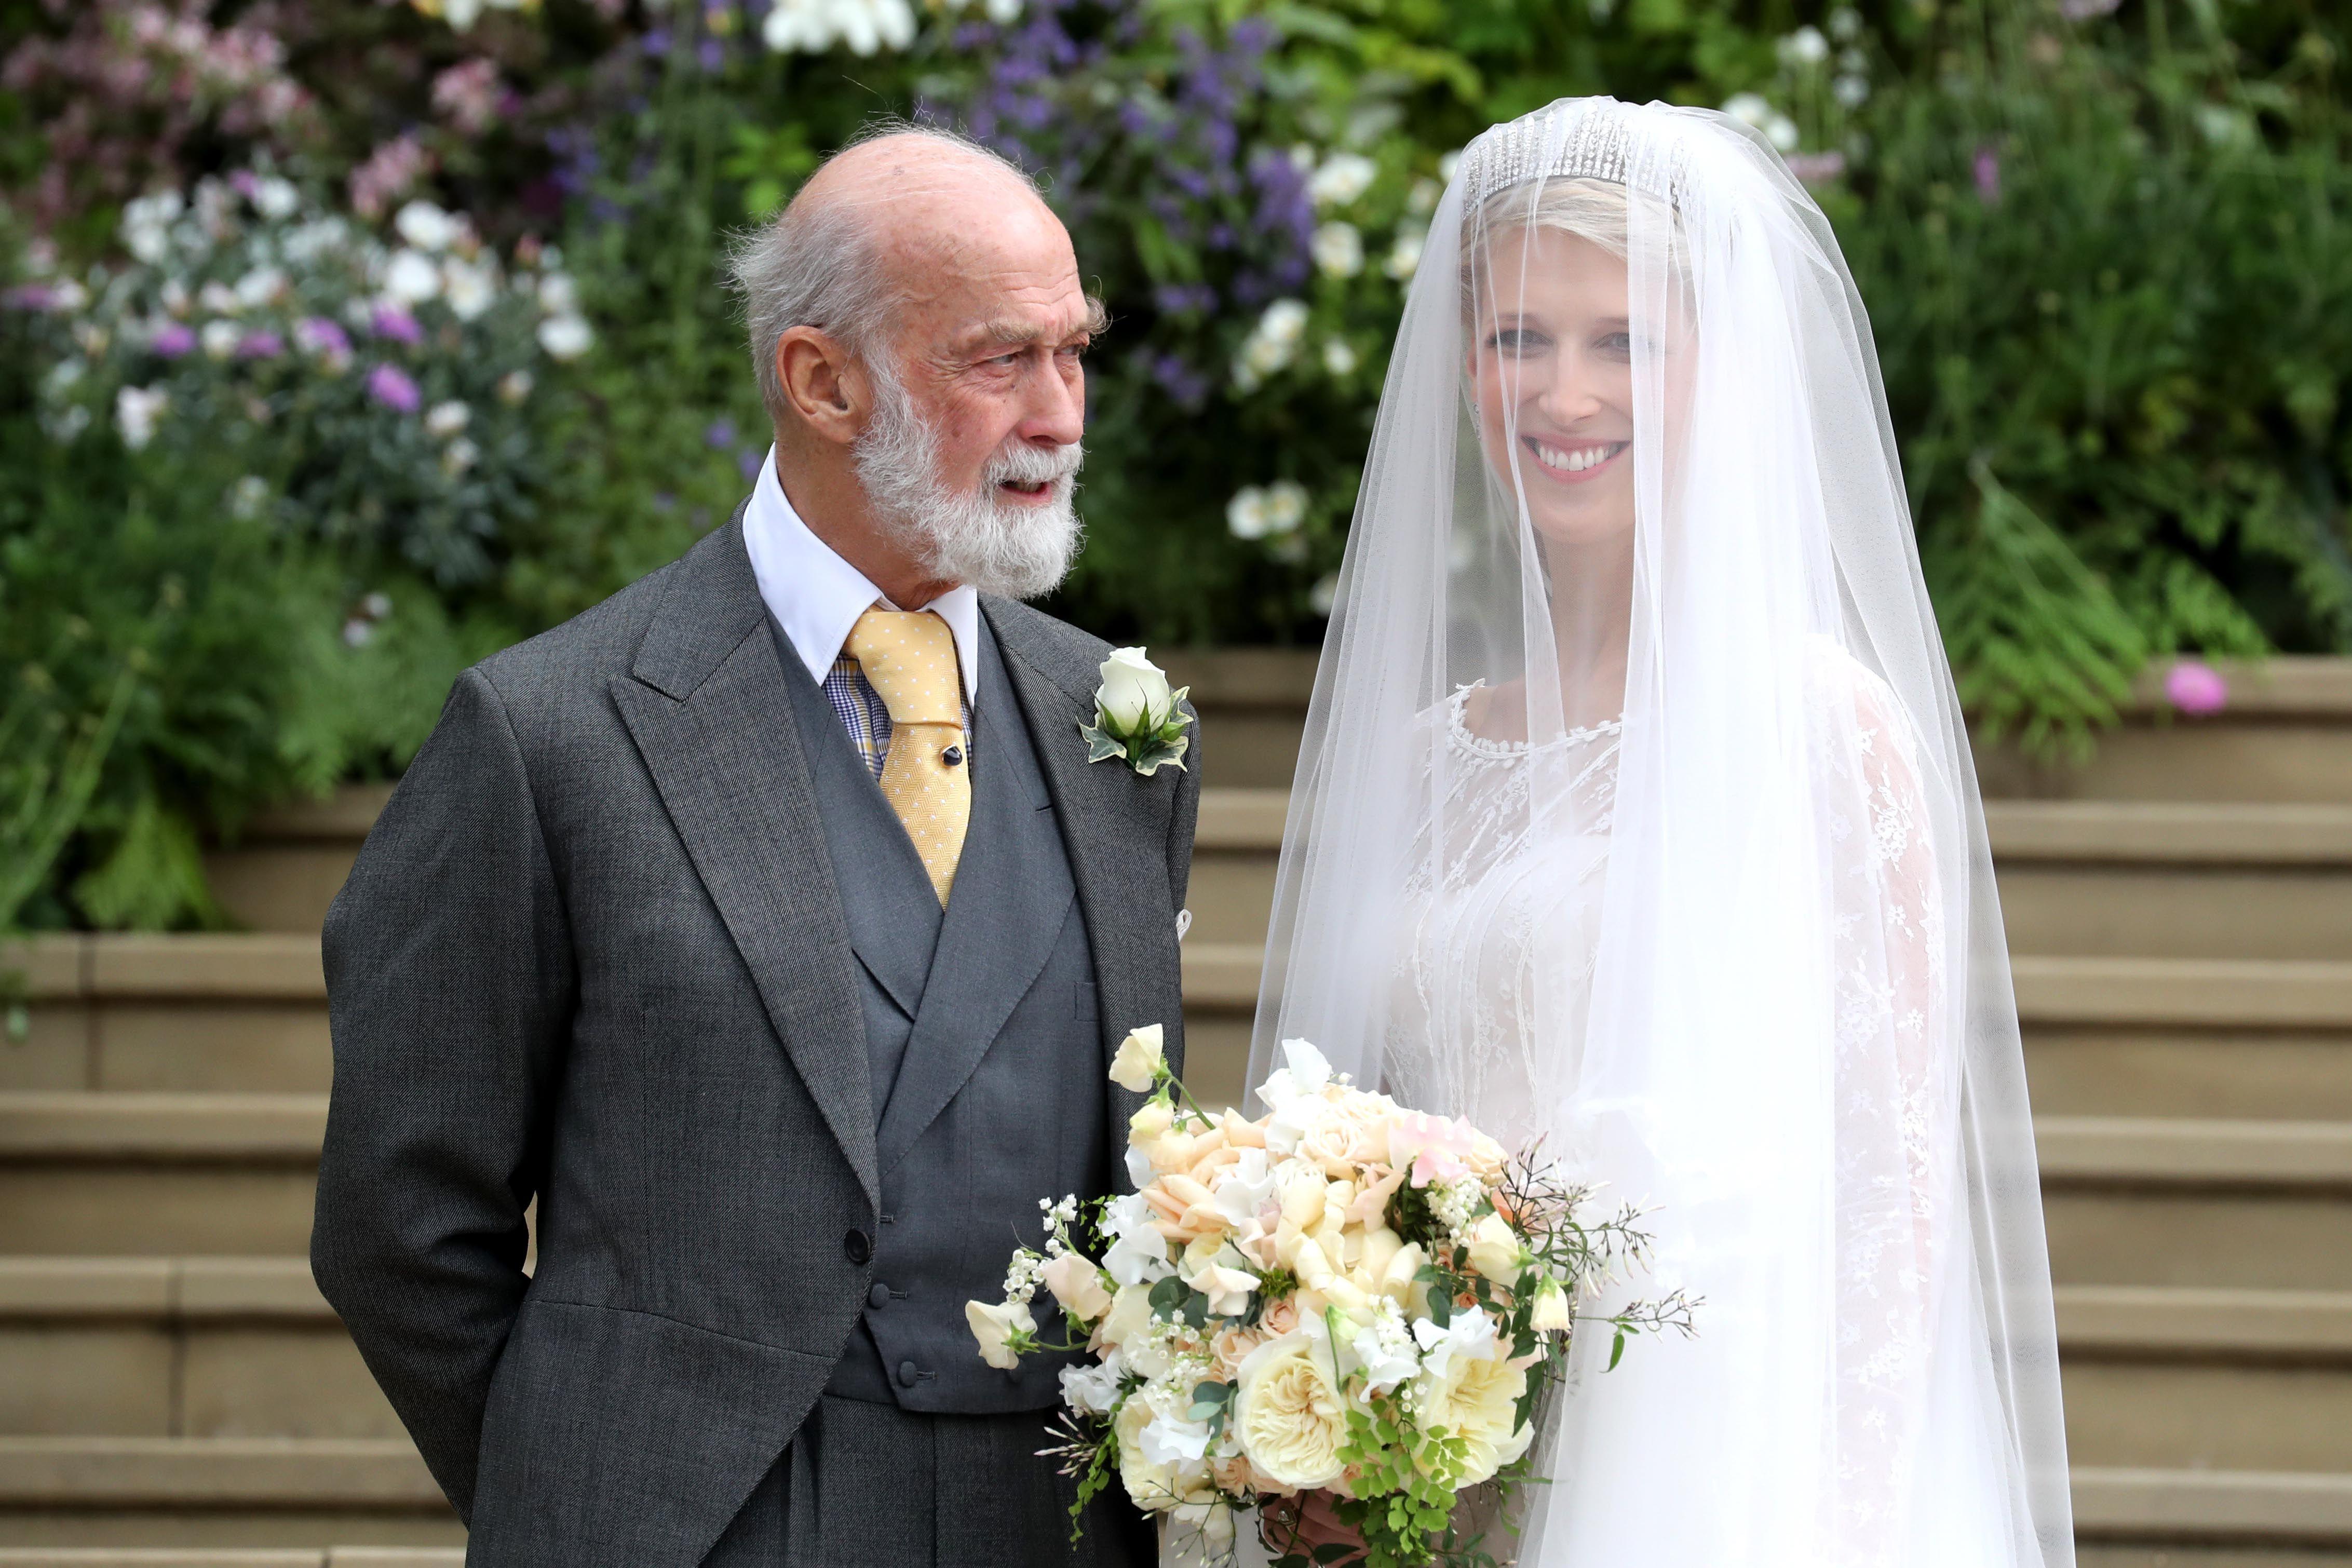 Lady Gabriella Windsor's wedding dress designer on creating a gown for a modern royal bride